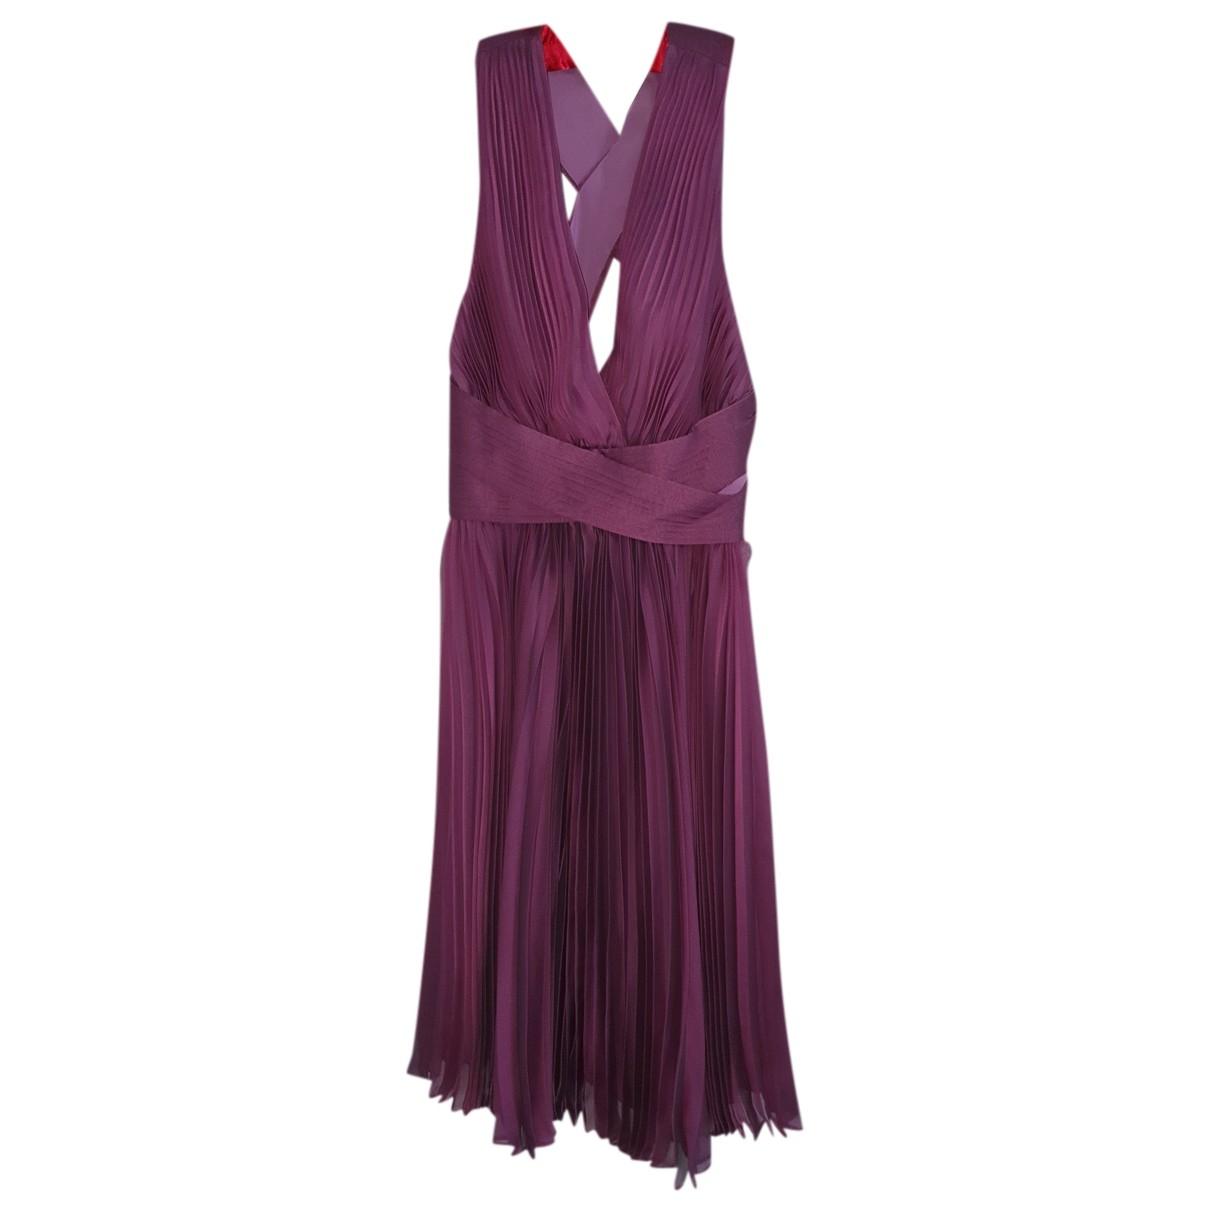 Halston Heritage \N Kleid in  Lila Seide